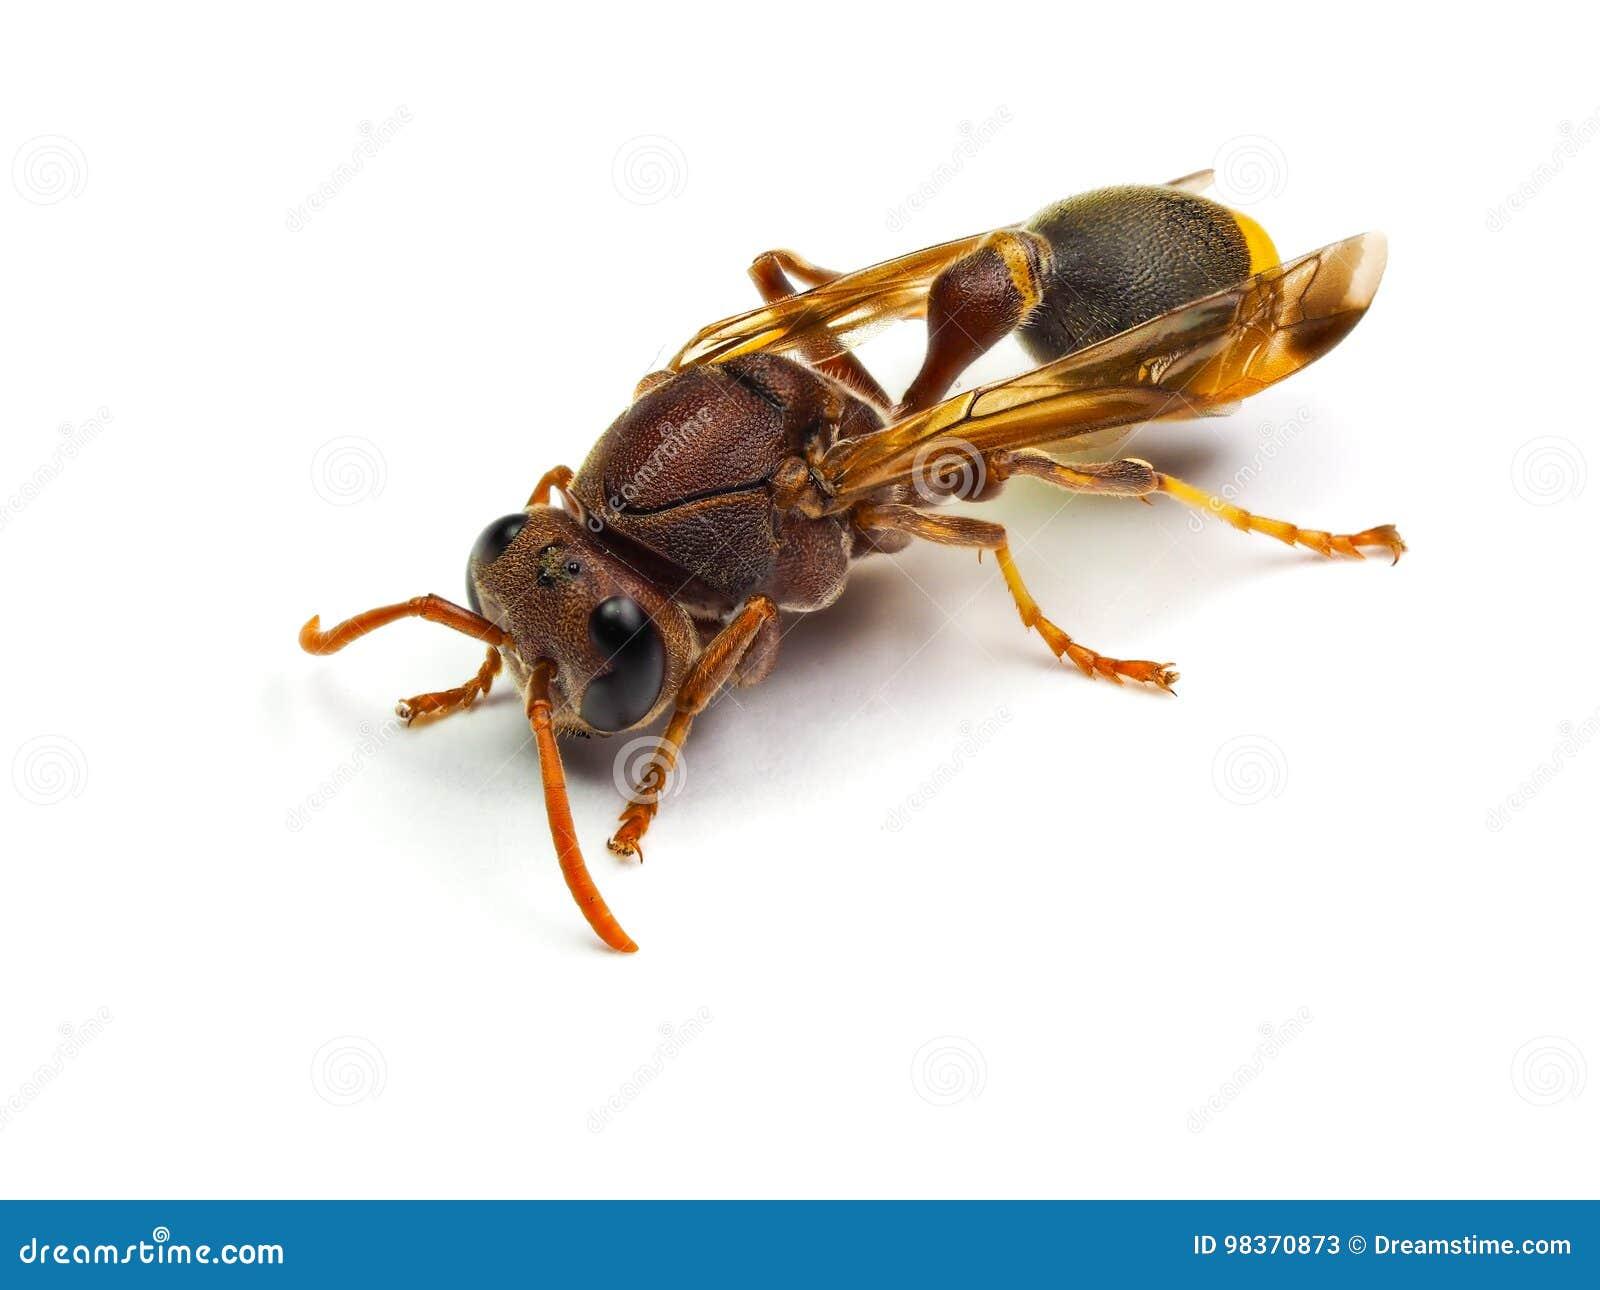 red wasp hornet isolated on white background stock image image of